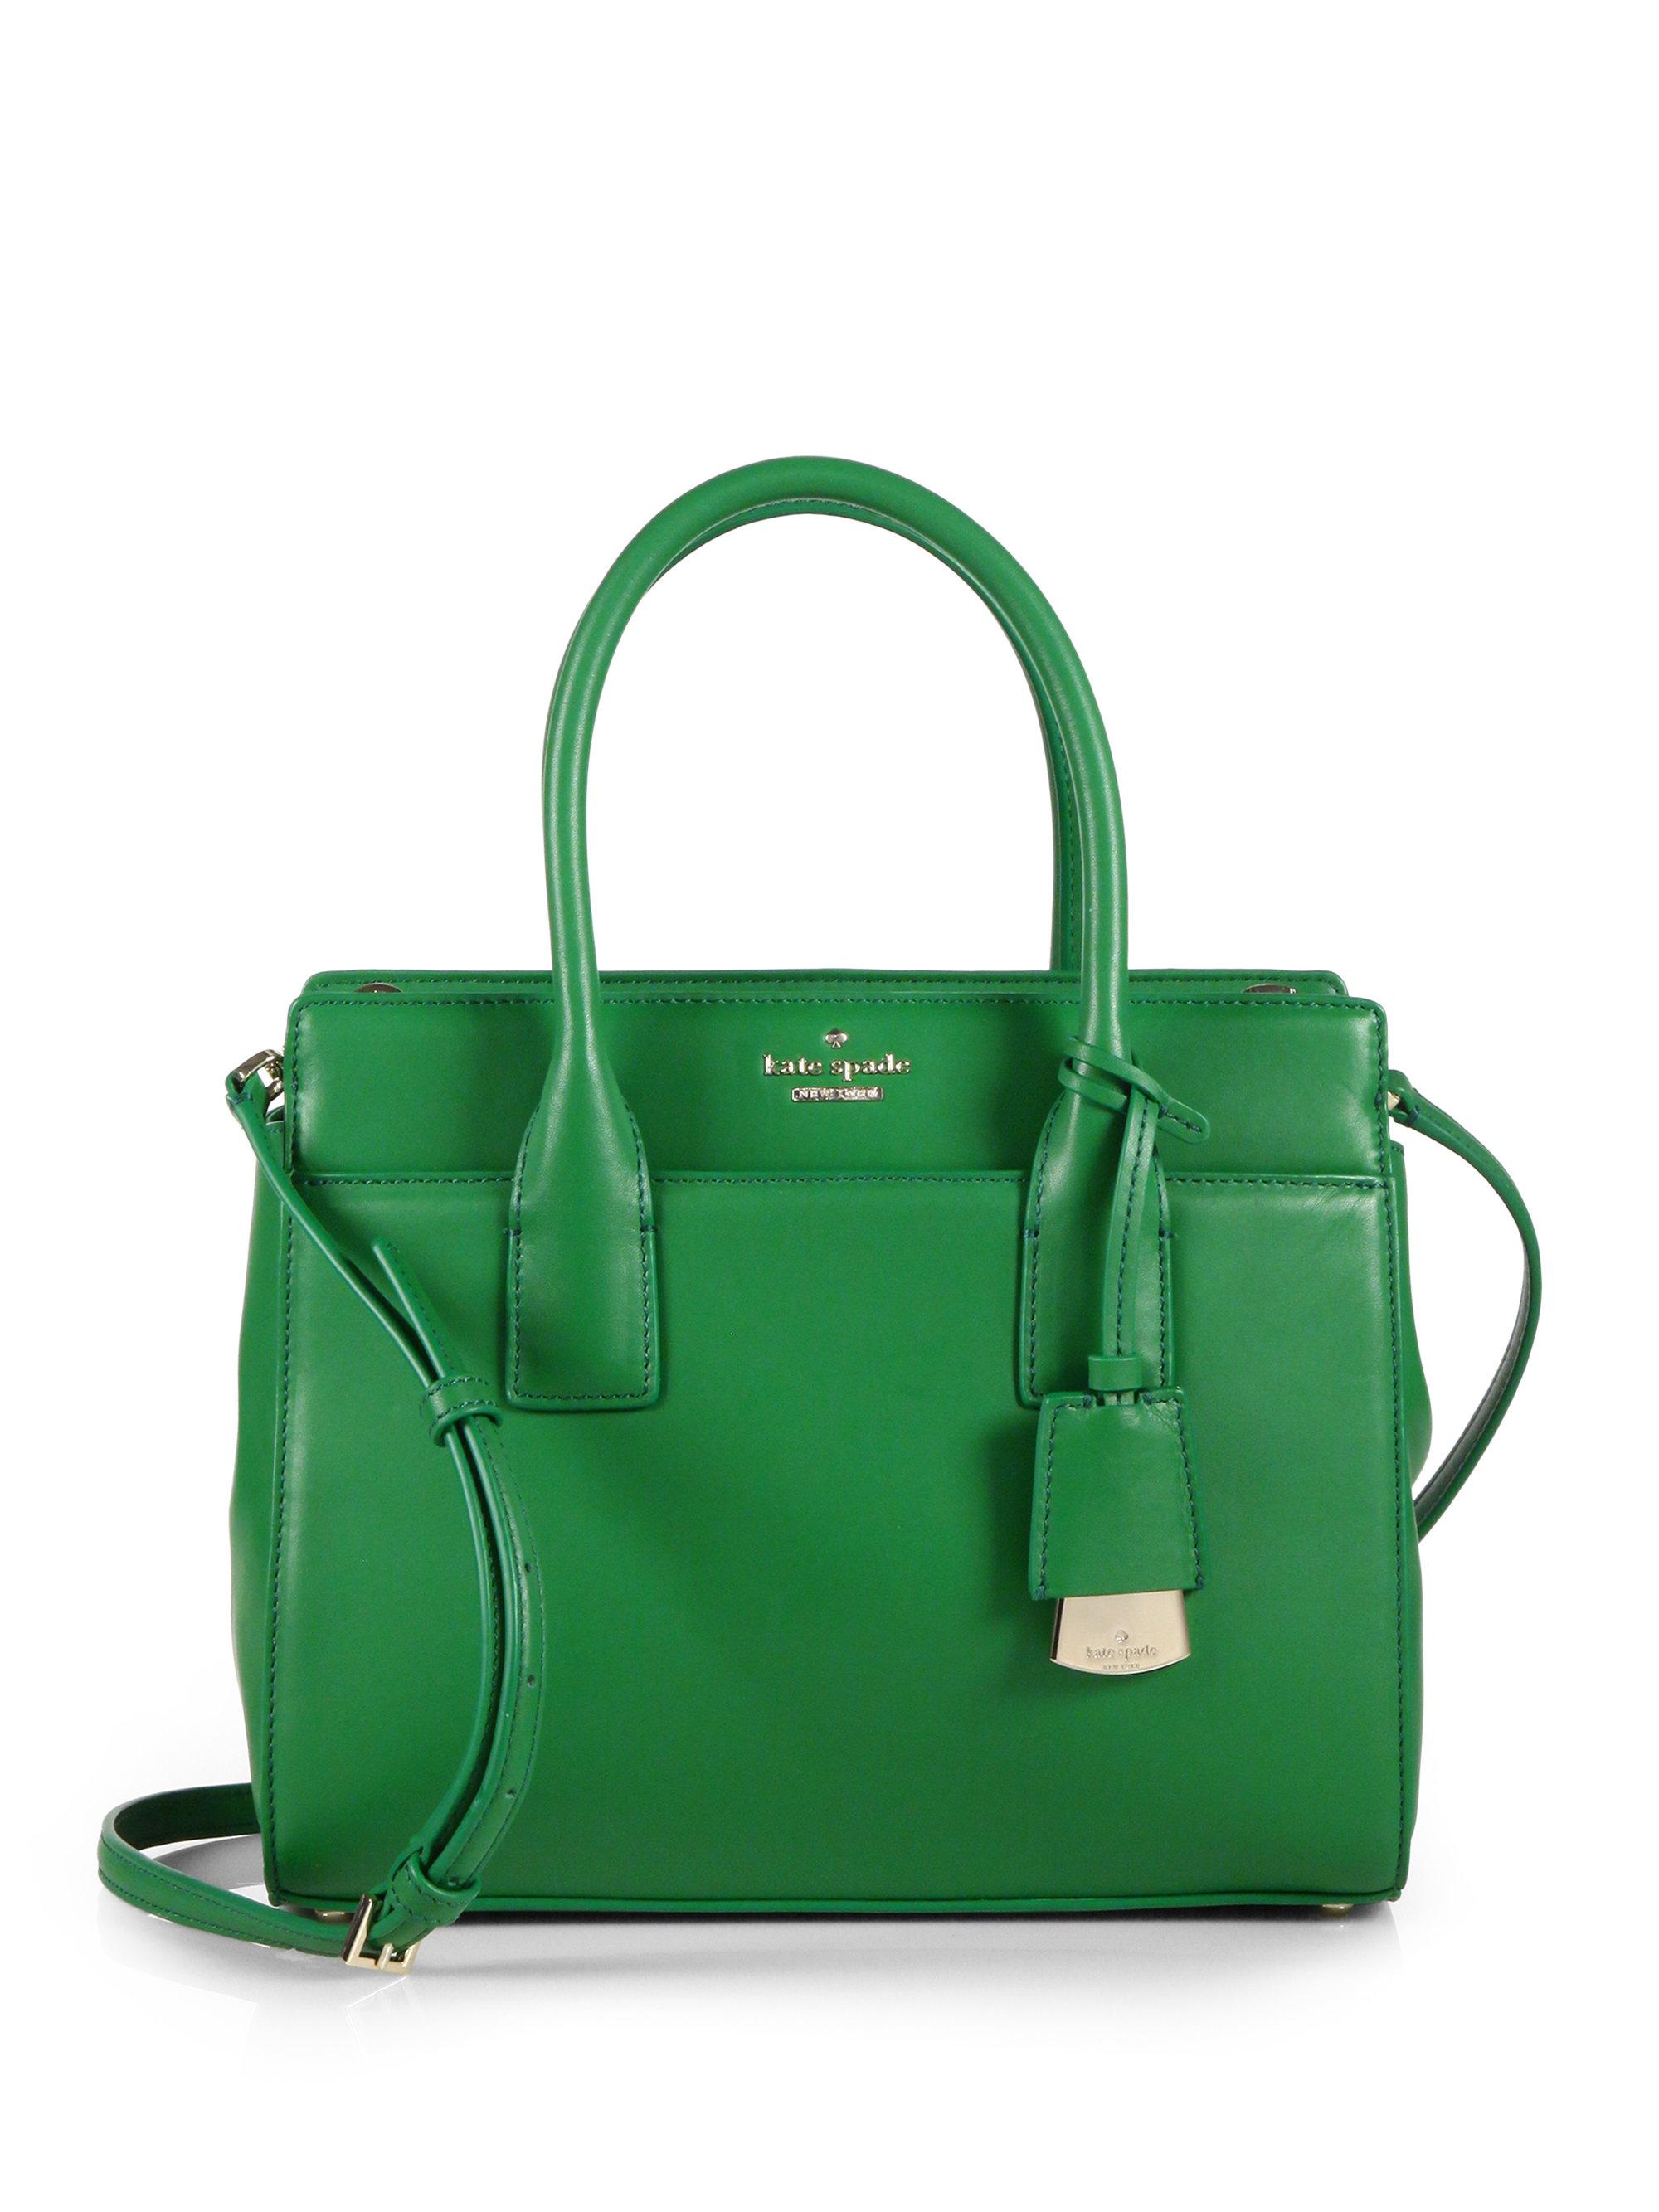 kate spade greenery sac à main